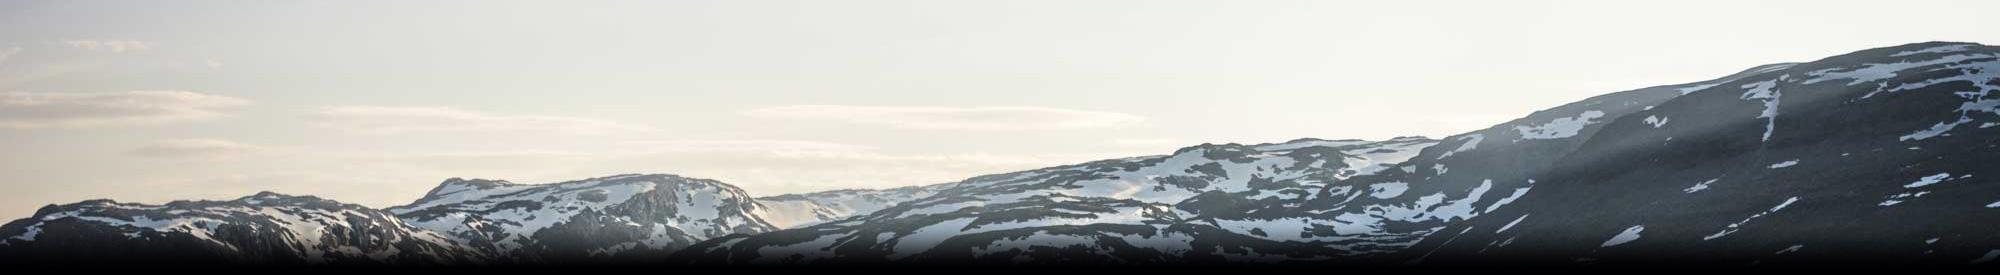 rolling snowy hills